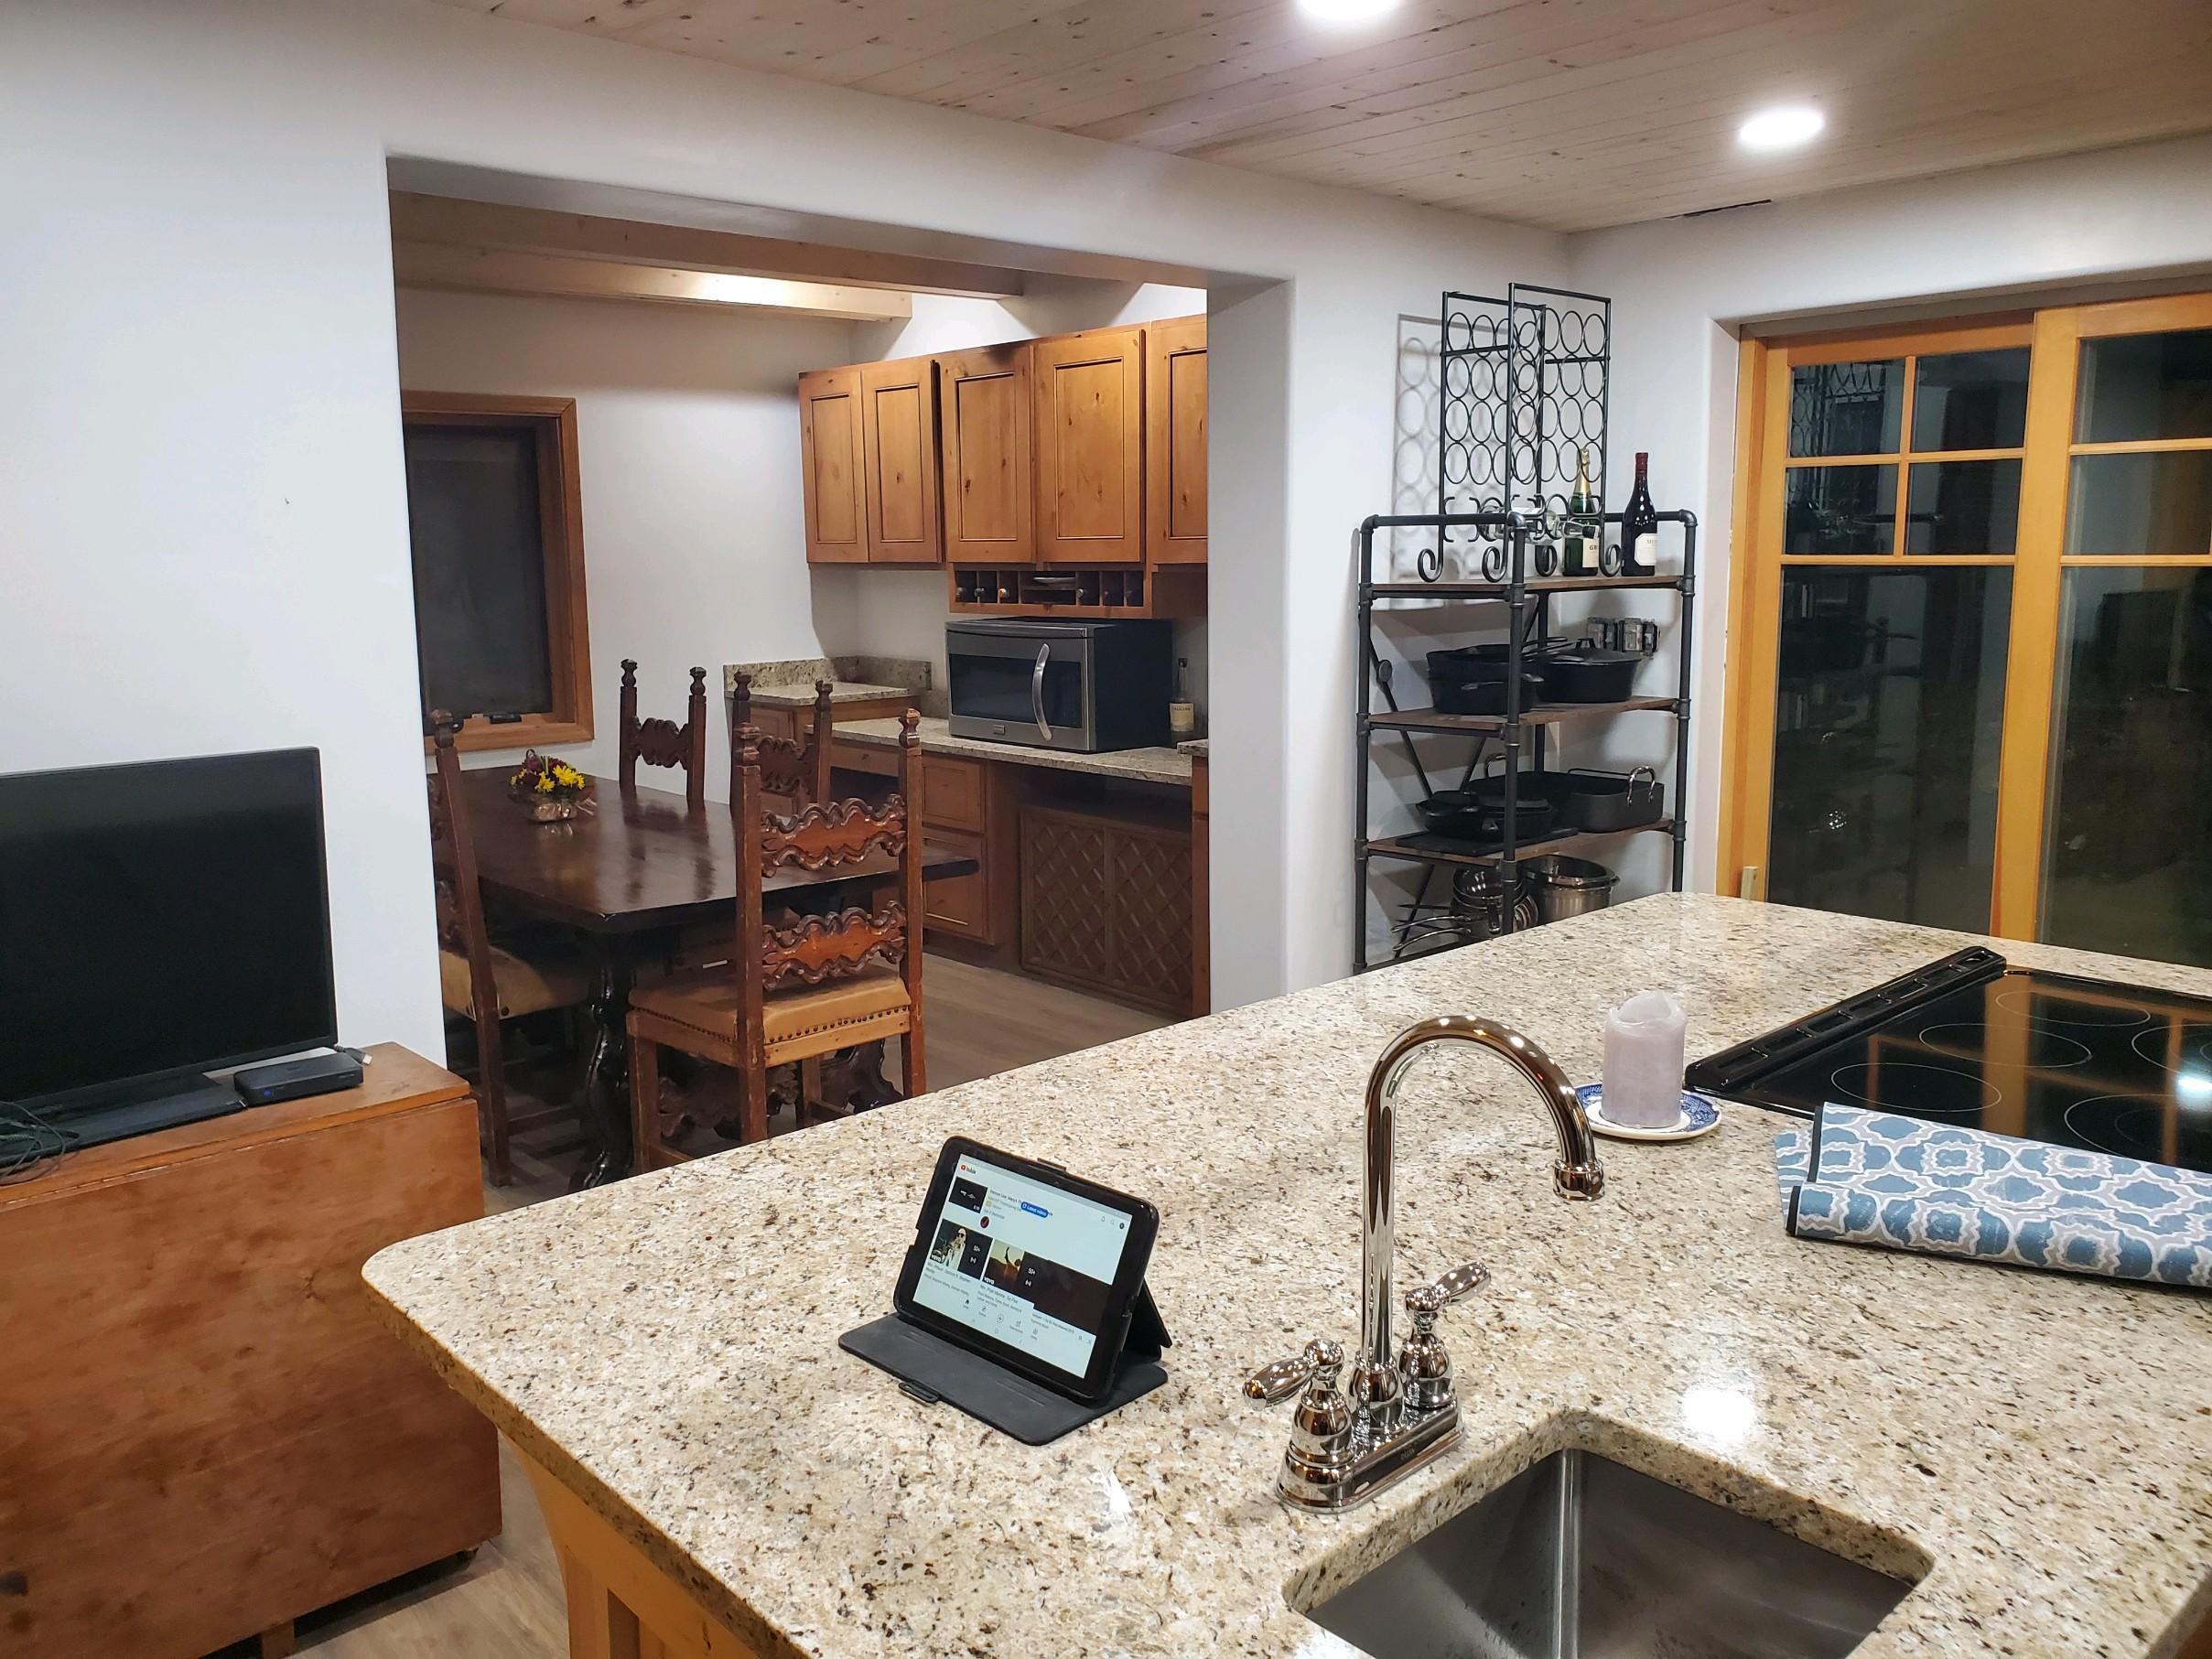 image showing Kitchen Remodel After